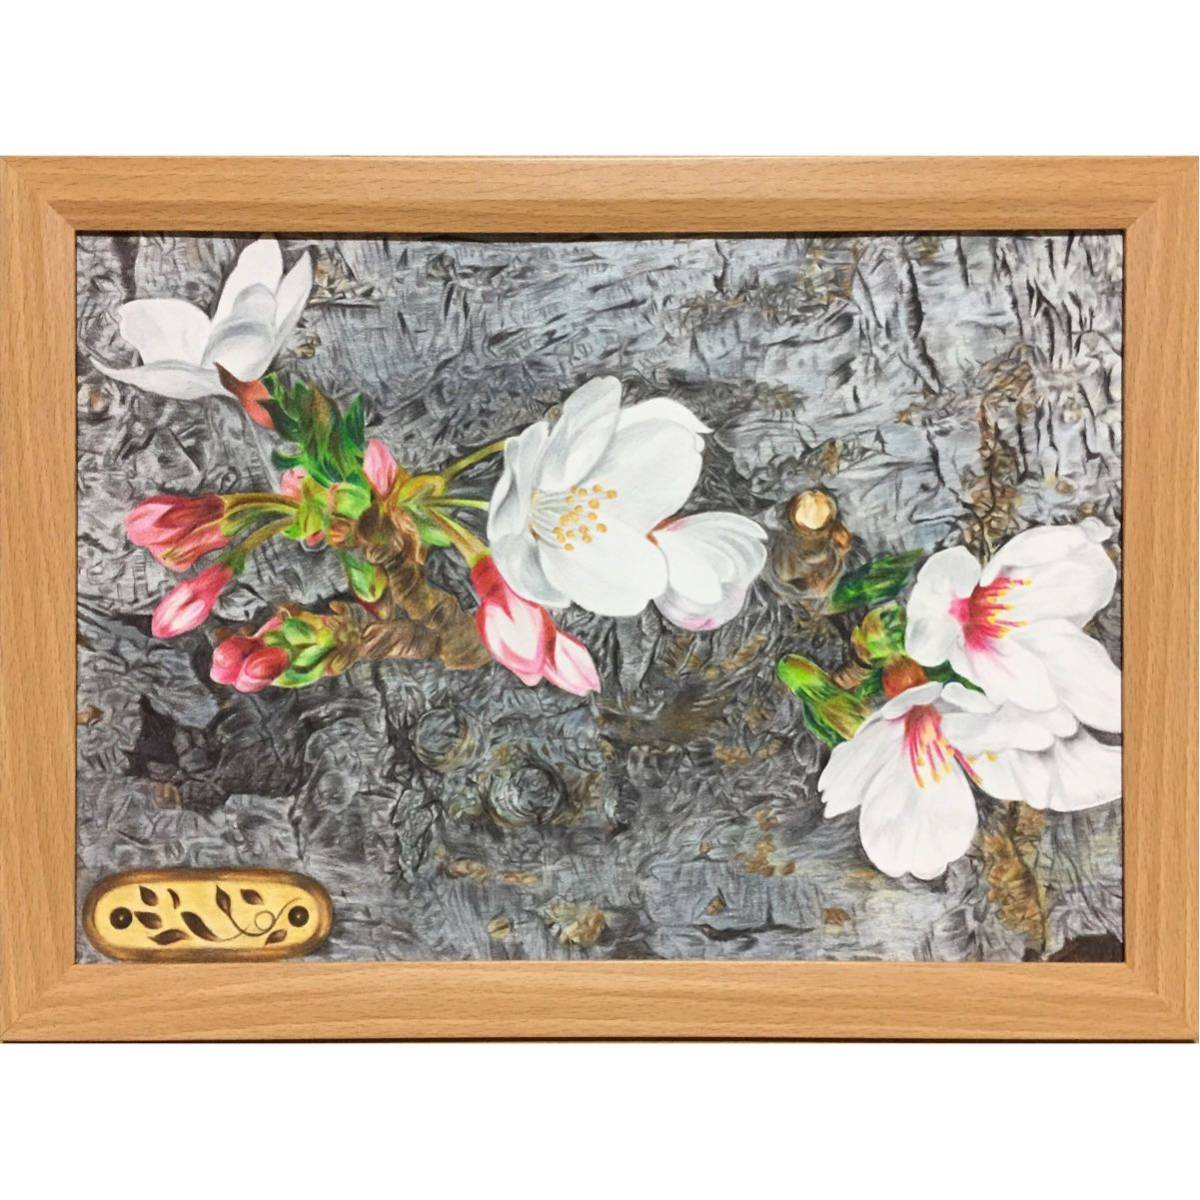 色鉛筆画「 必然 」A4・額付き◇◆手描き◇原画◆桜・花・風景画◇◆yotto_画像2